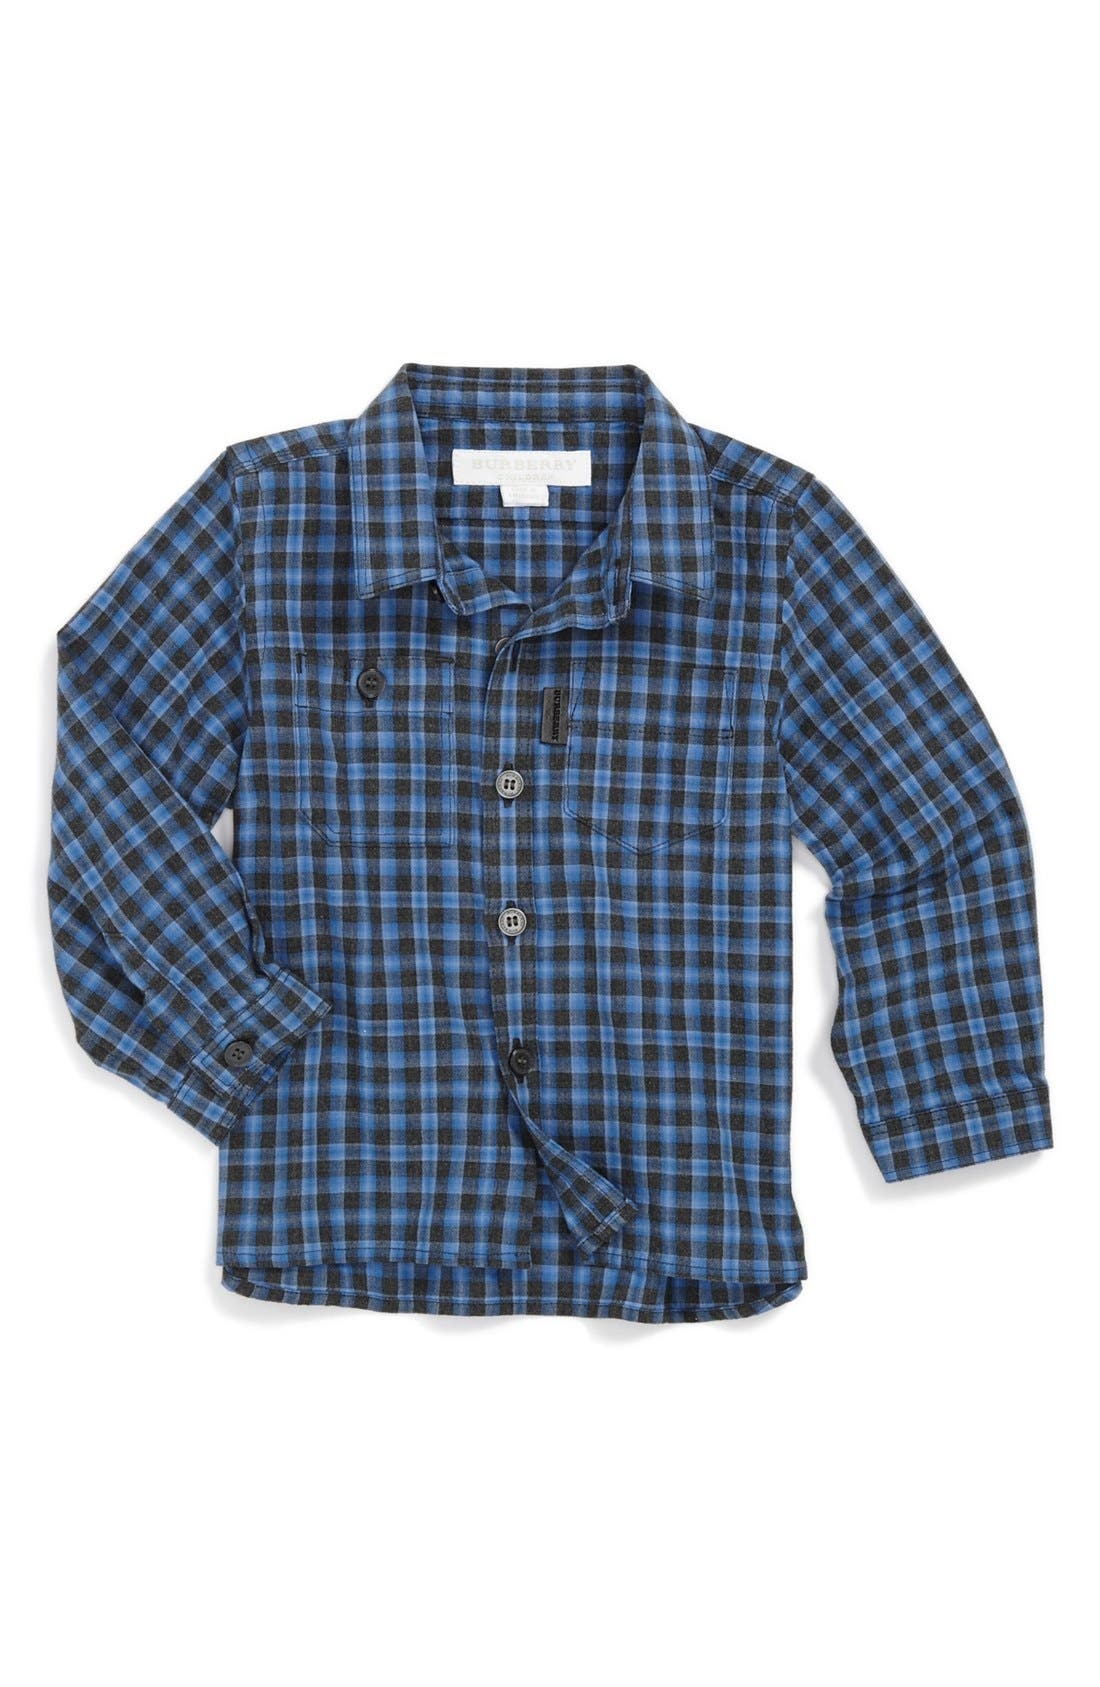 Alternate Image 1 Selected - Burberry Dress Shirt (Baby Boys)